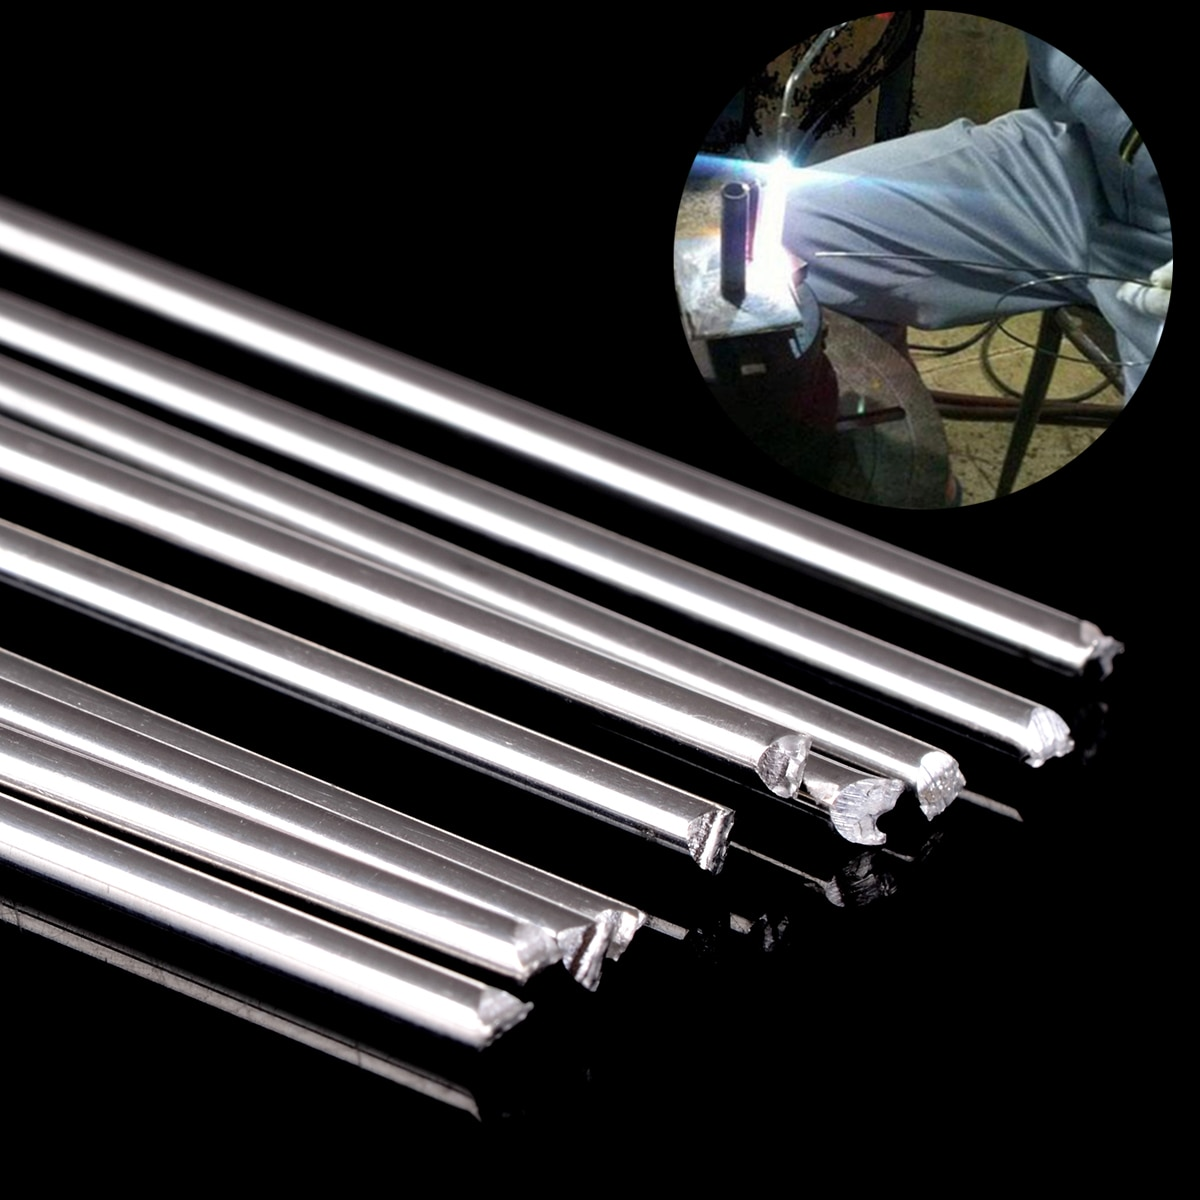 10pcs metal alumínio magnésio prata solda haste com baixa temperatura 1.6mm diâmetro 450mm comprimento